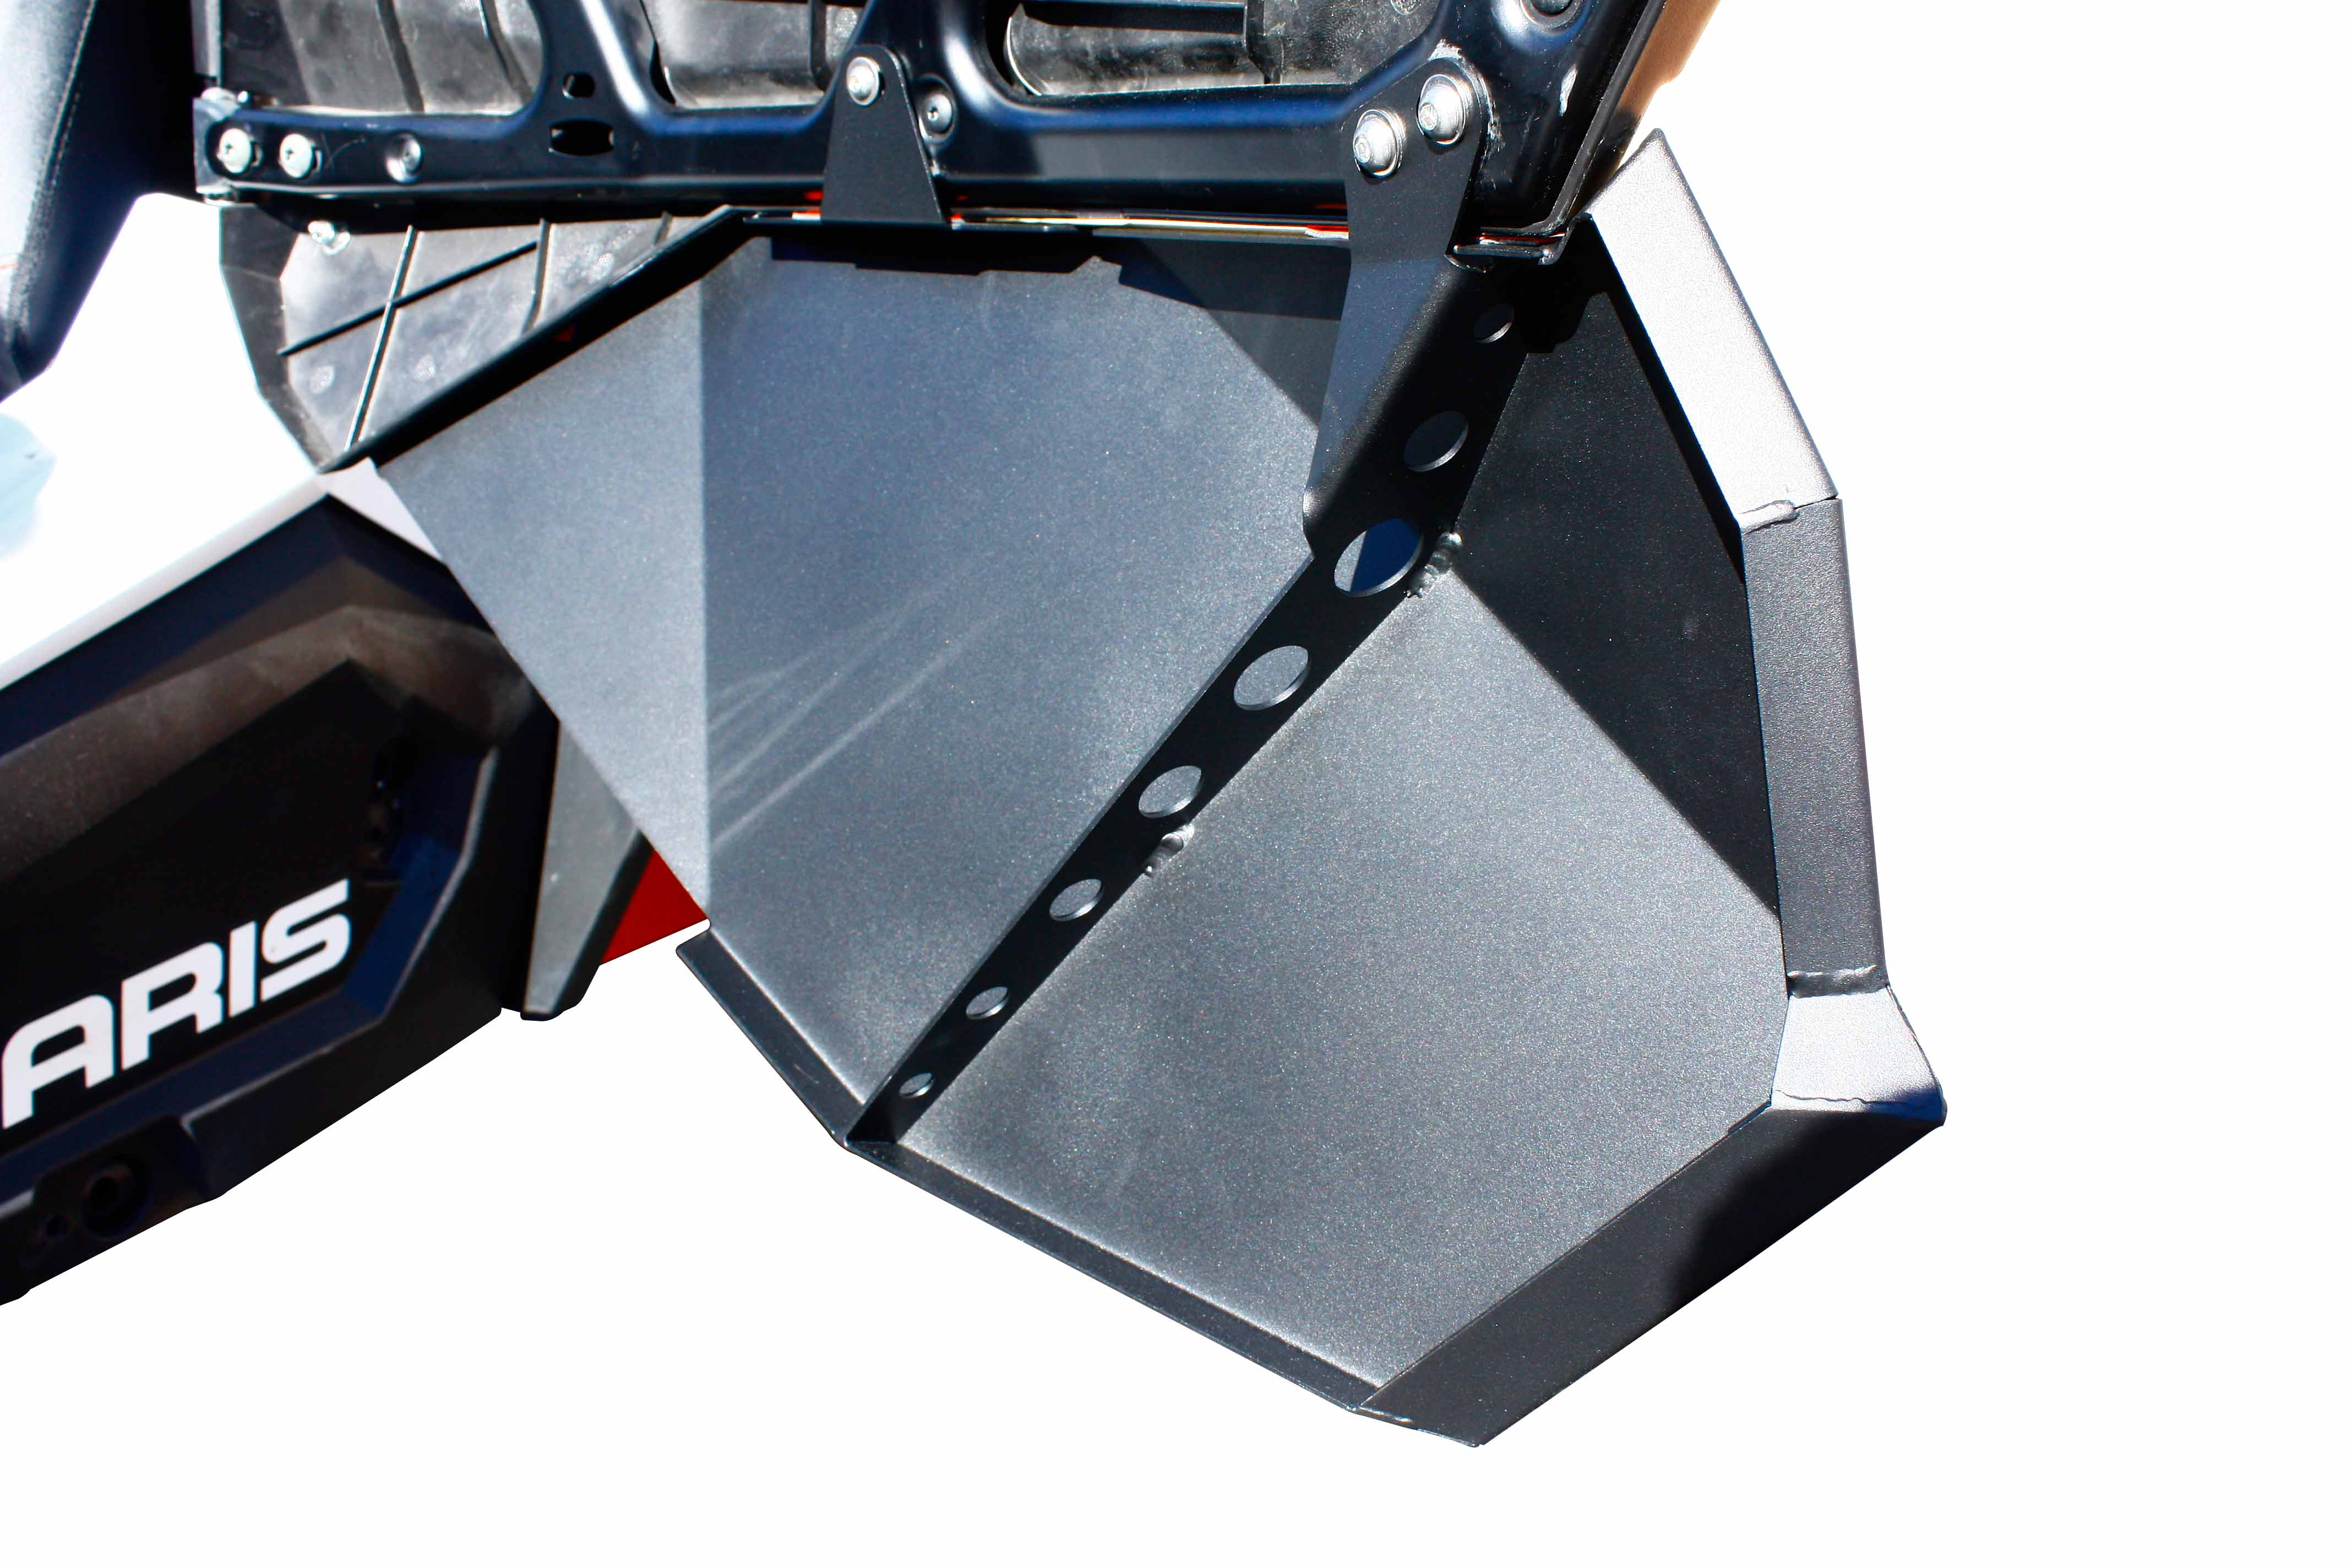 Dragonfire Door Panel & Slammer Kit for RZR XP 1000 / RZR 900 / RZR XP Turbo